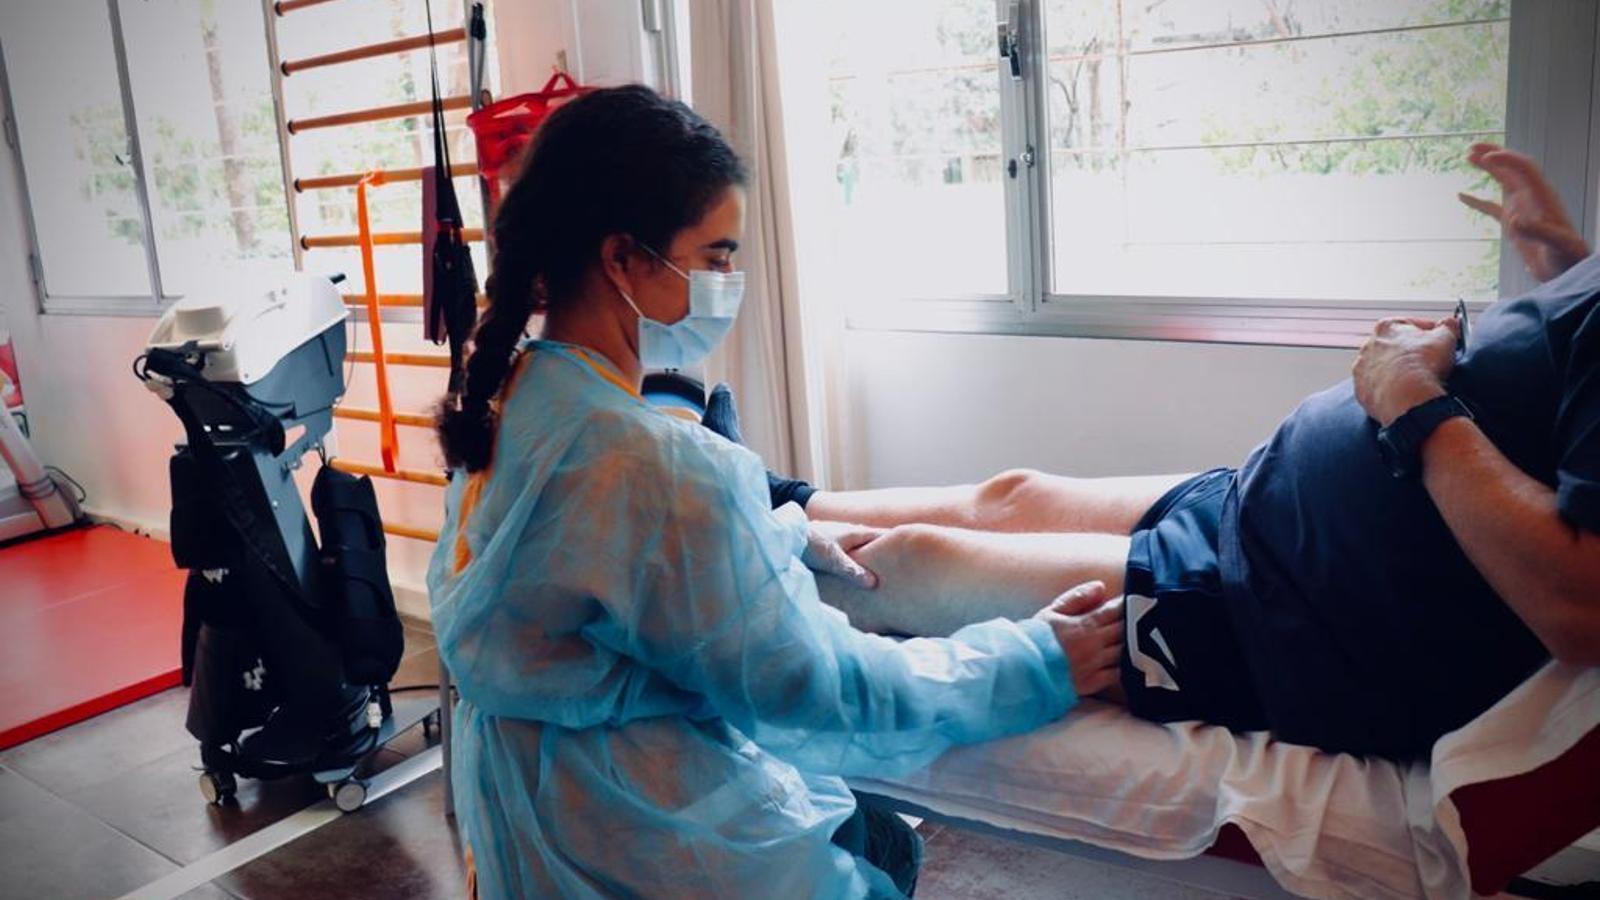 Lina Rahou treballant de fisioterapeuta